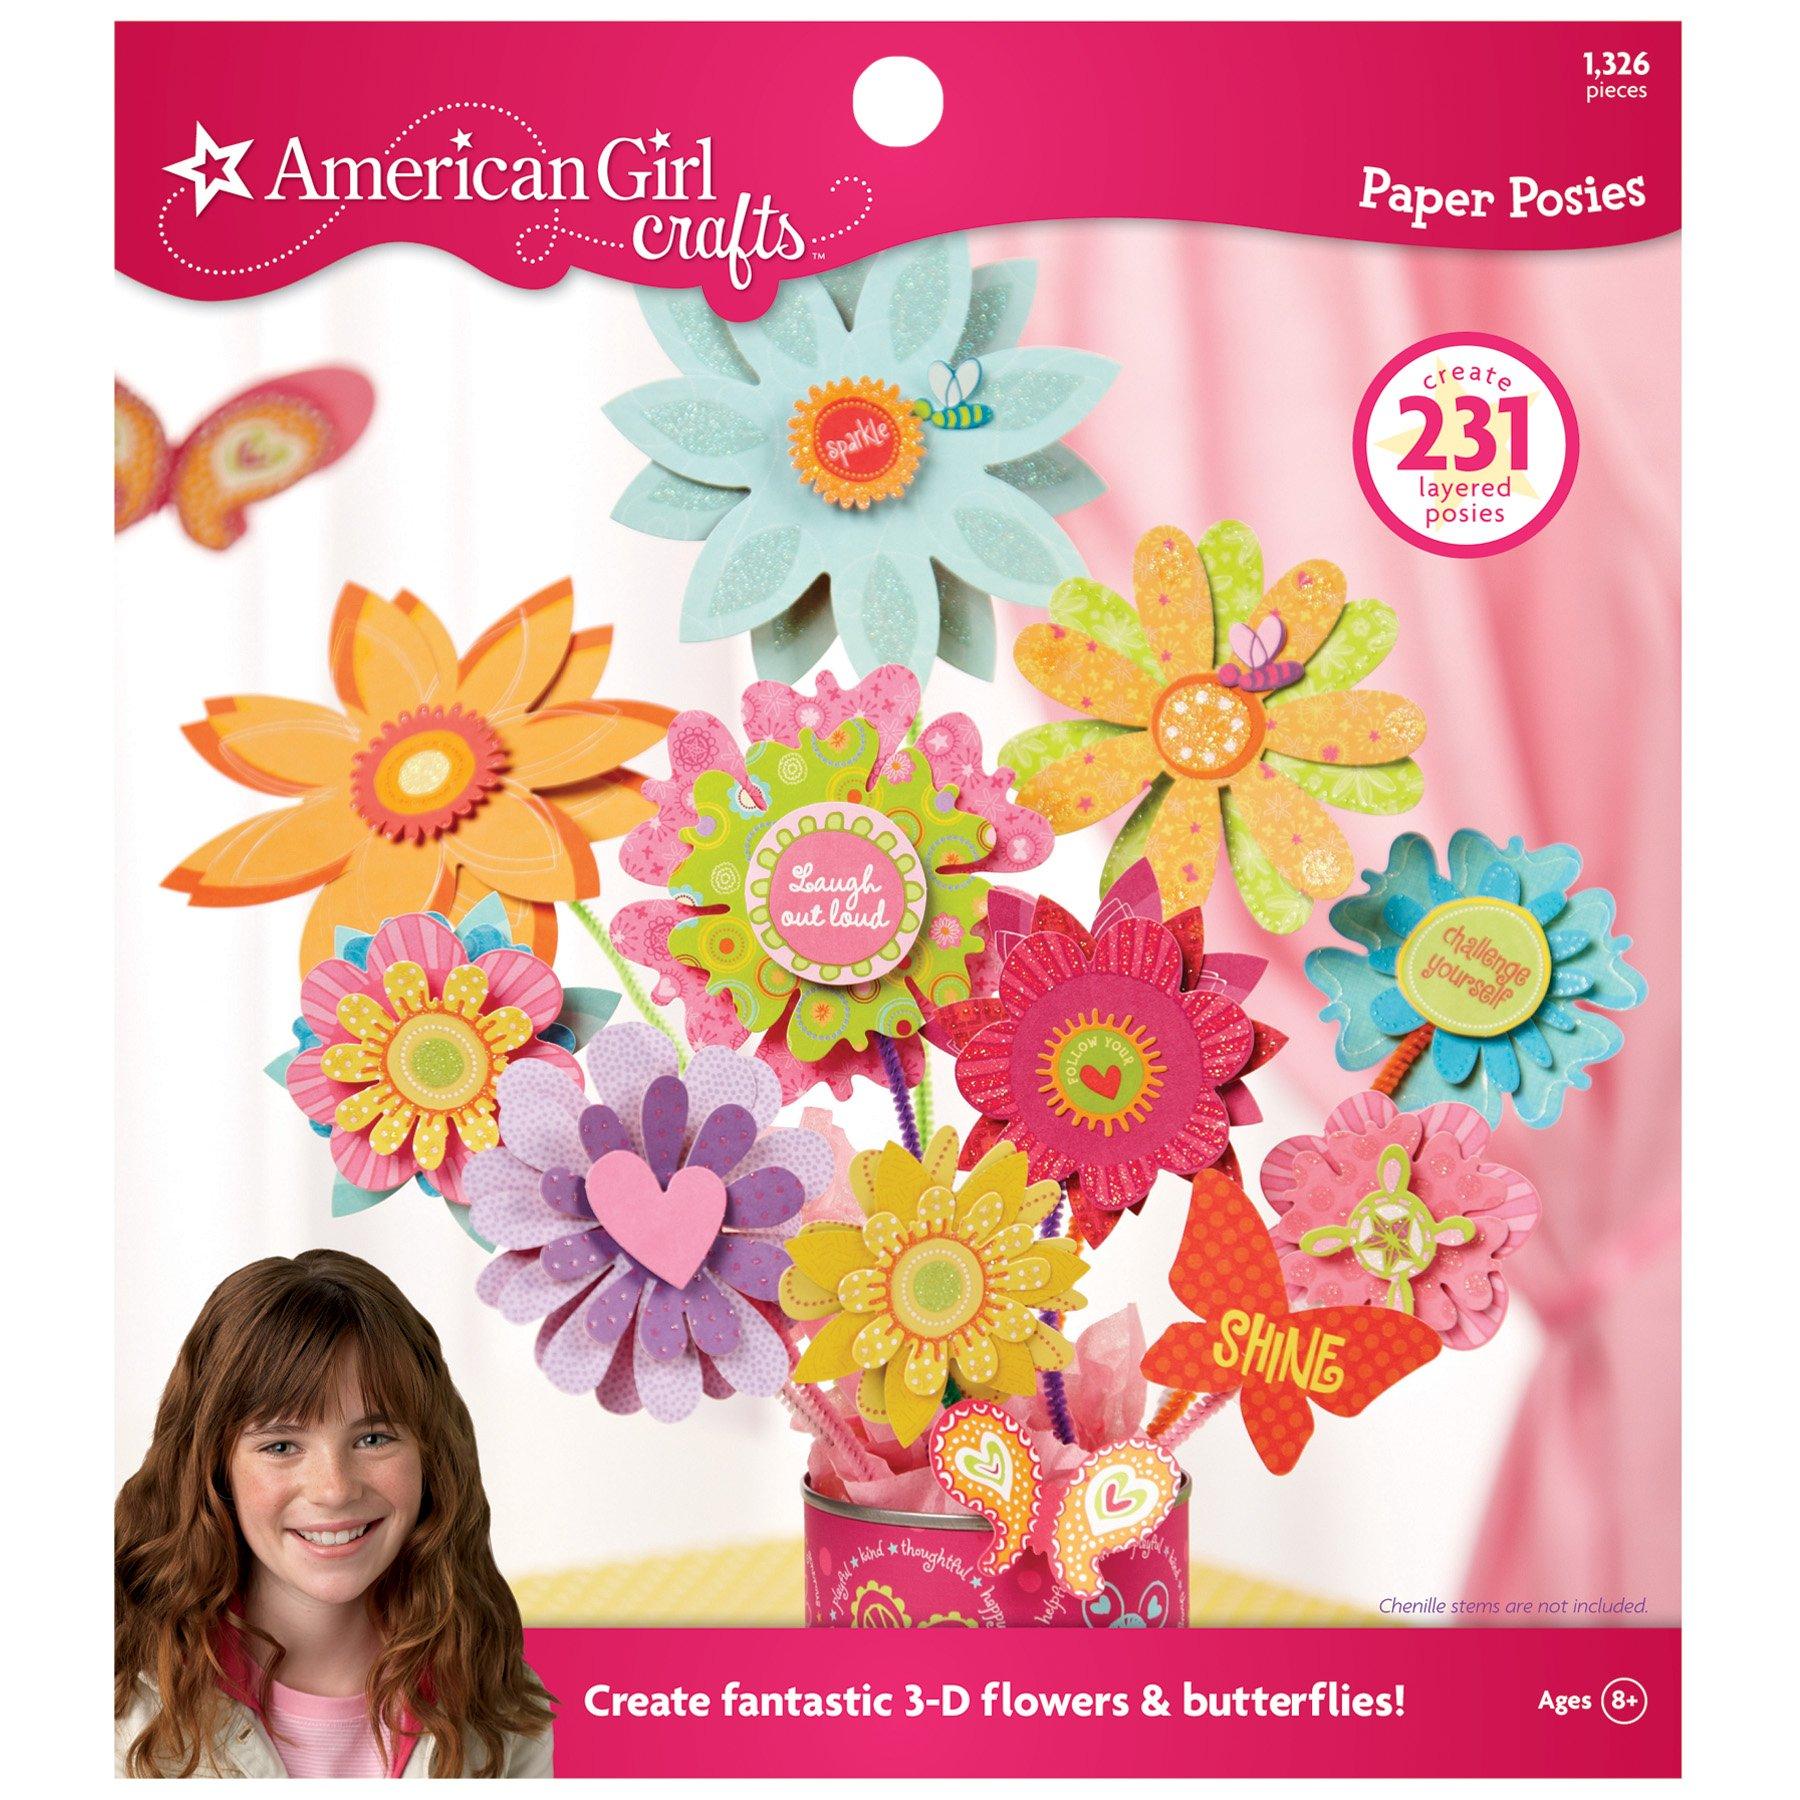 American Girl Crafts Paper Flower Posies Activity Kit, 1326pc by American Girl Crafts